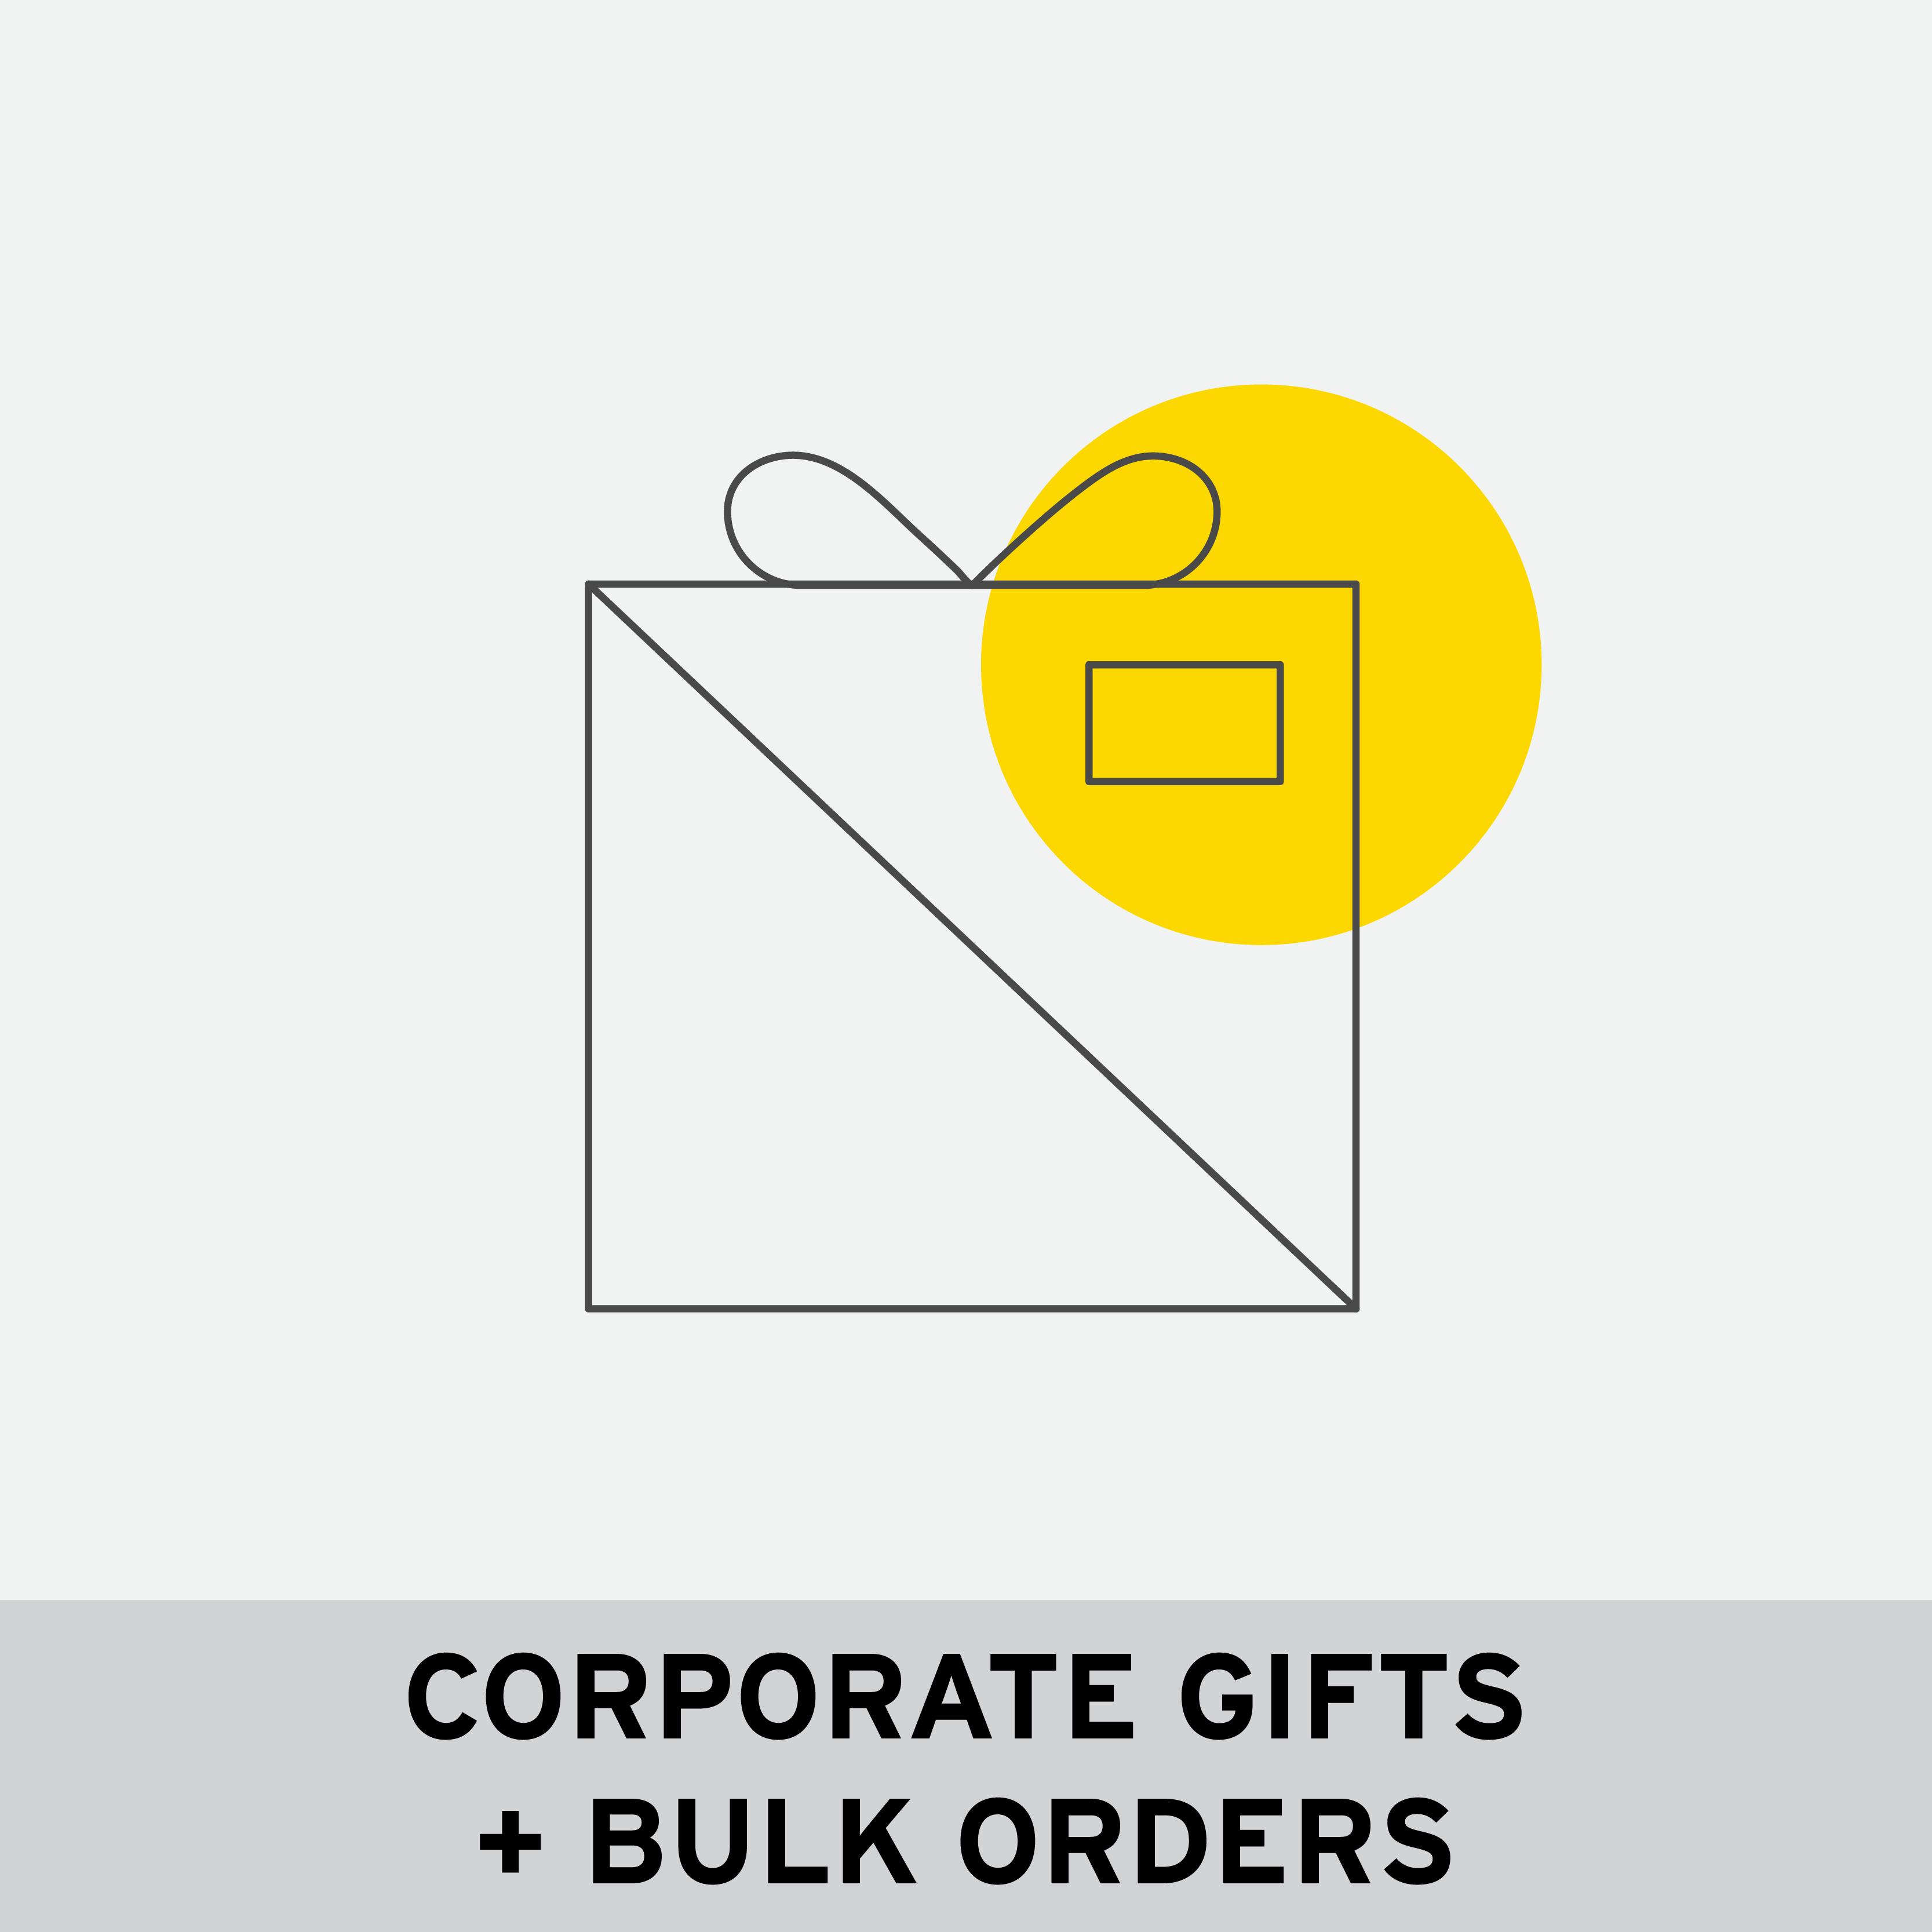 CORPORATE GIFTS + BULK ORDERS